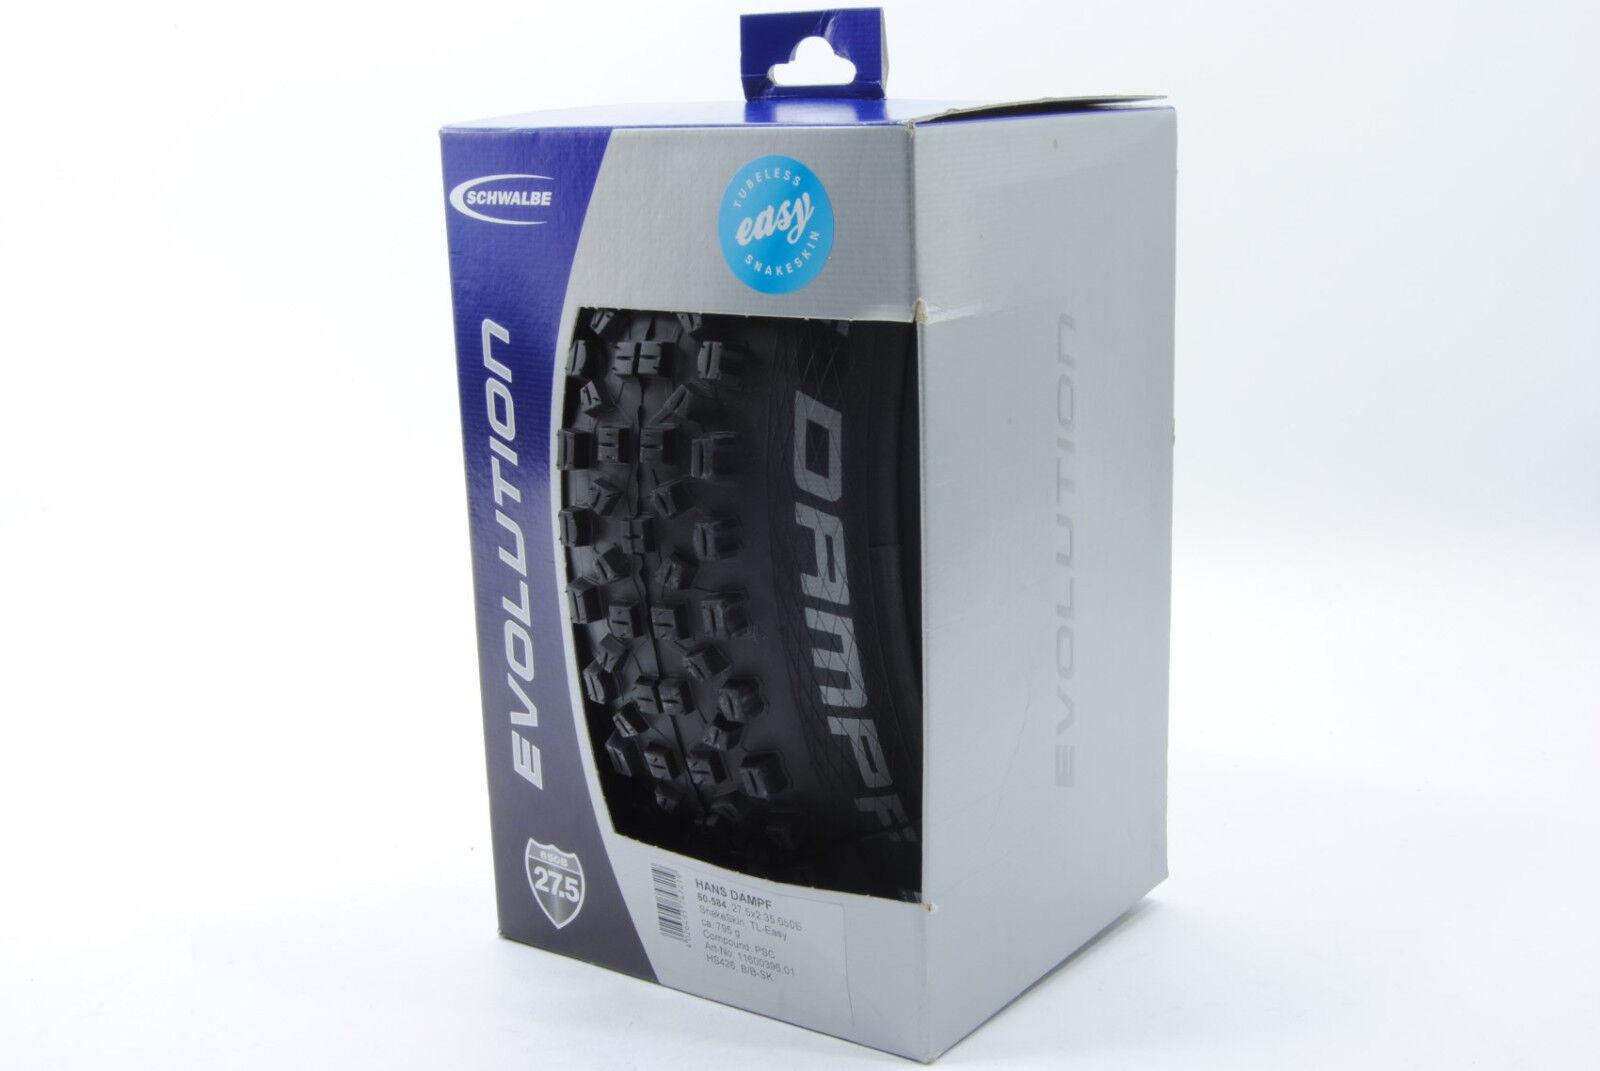 SCHWALBE HANS DAMPF Pacestar Snakeskin TL-READY EASY 27.5 x 2.35 Tire 27.5x2.35